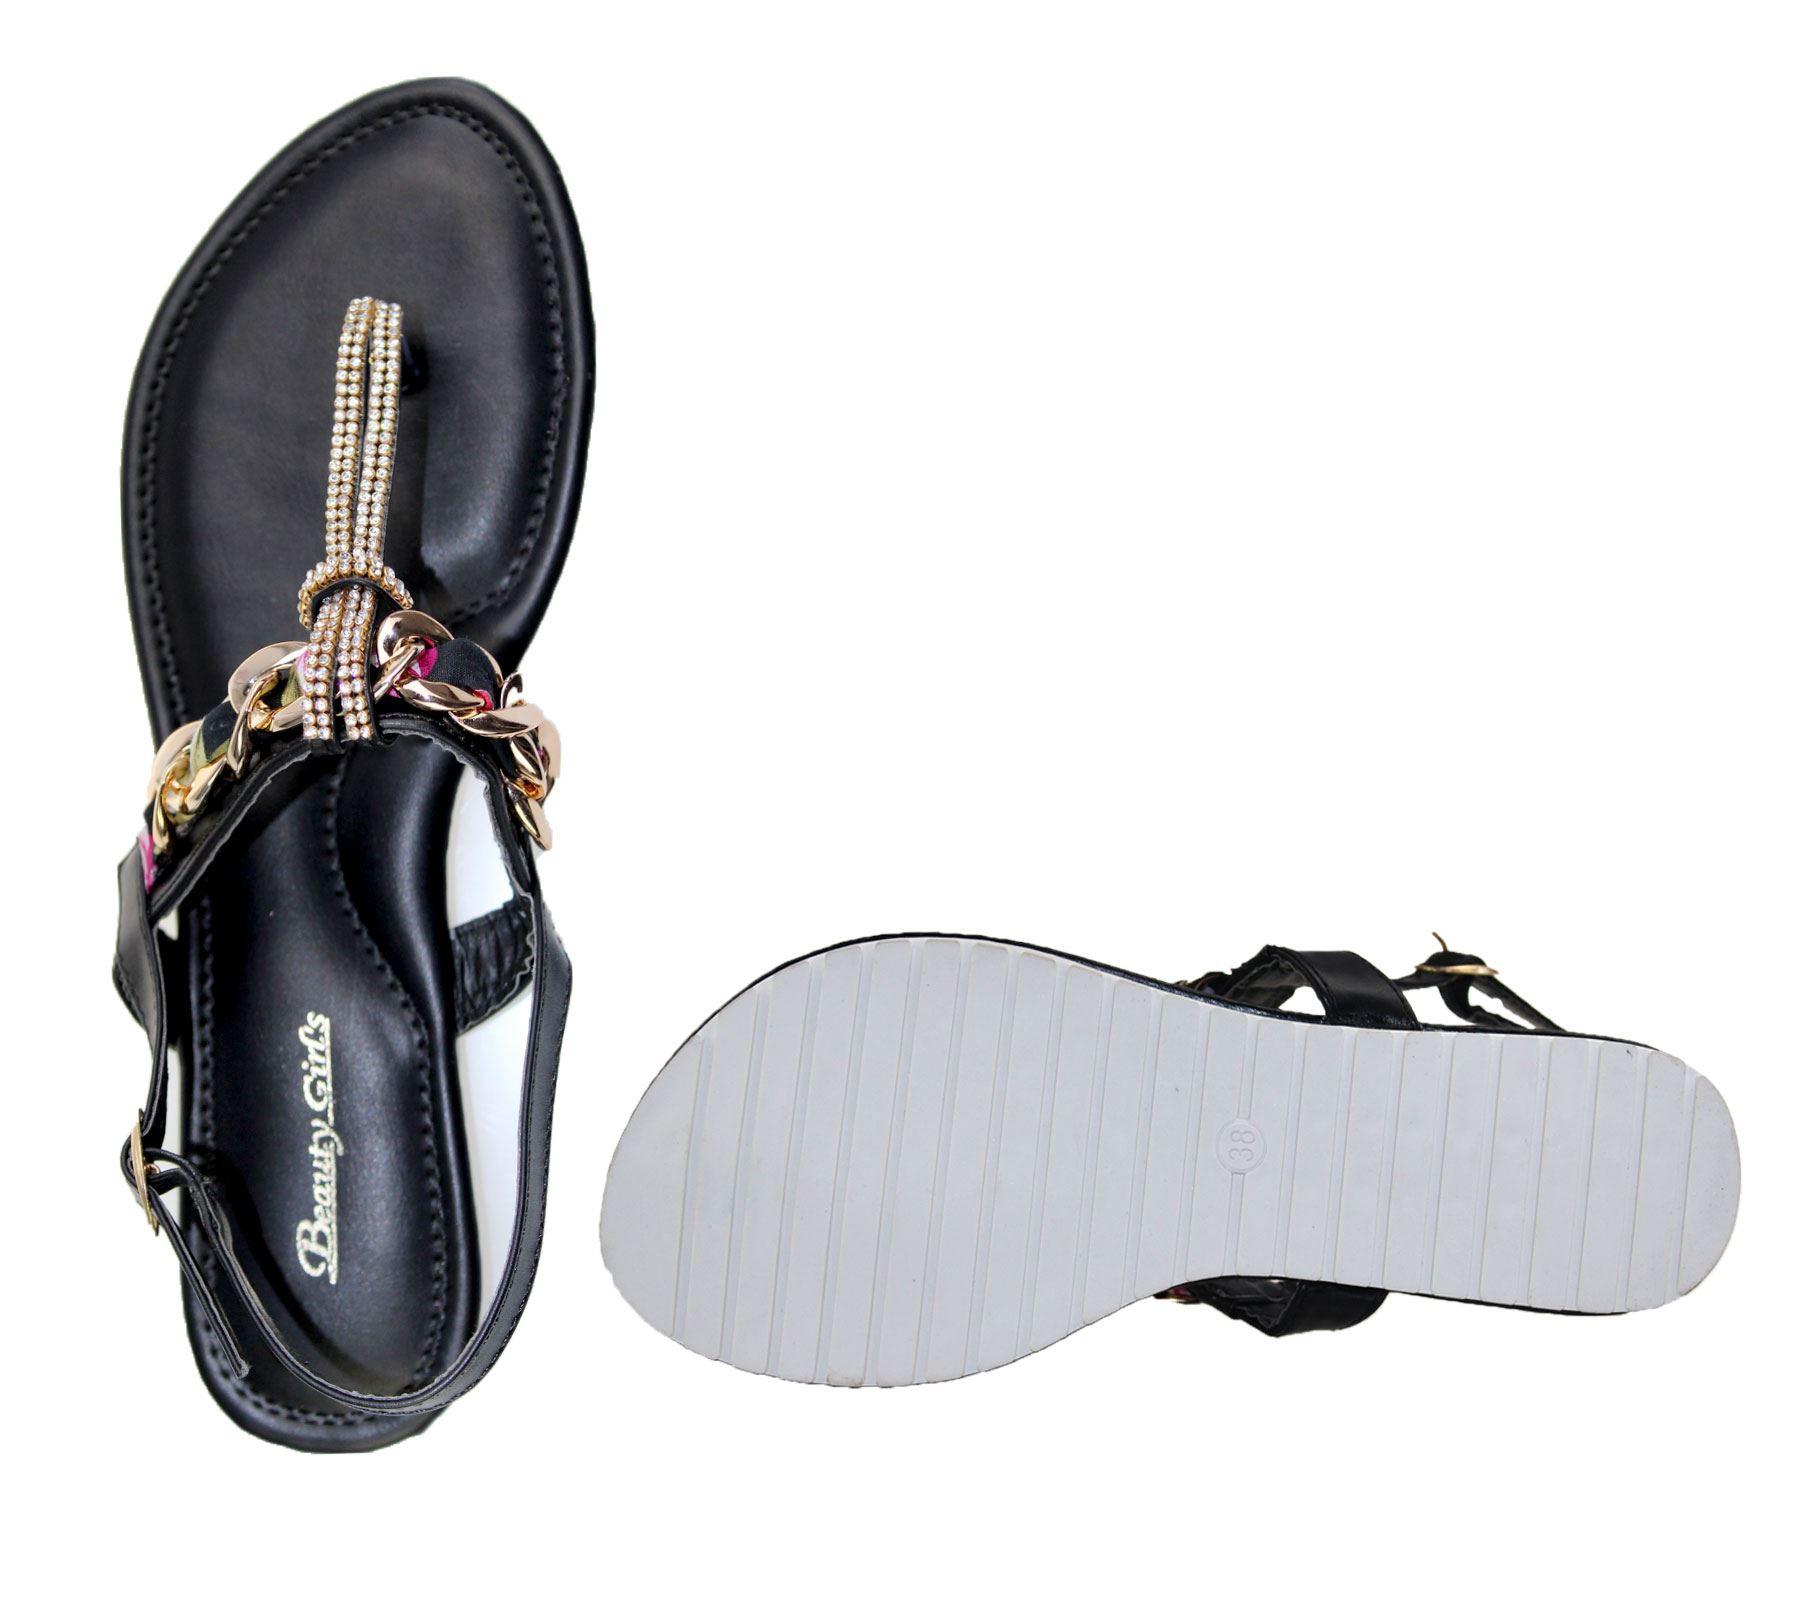 KOLLACHE-Womens-Buckle-Flat-Summer-Caual-Diamonte-Ladies-Evening-Party-Sandals thumbnail 5